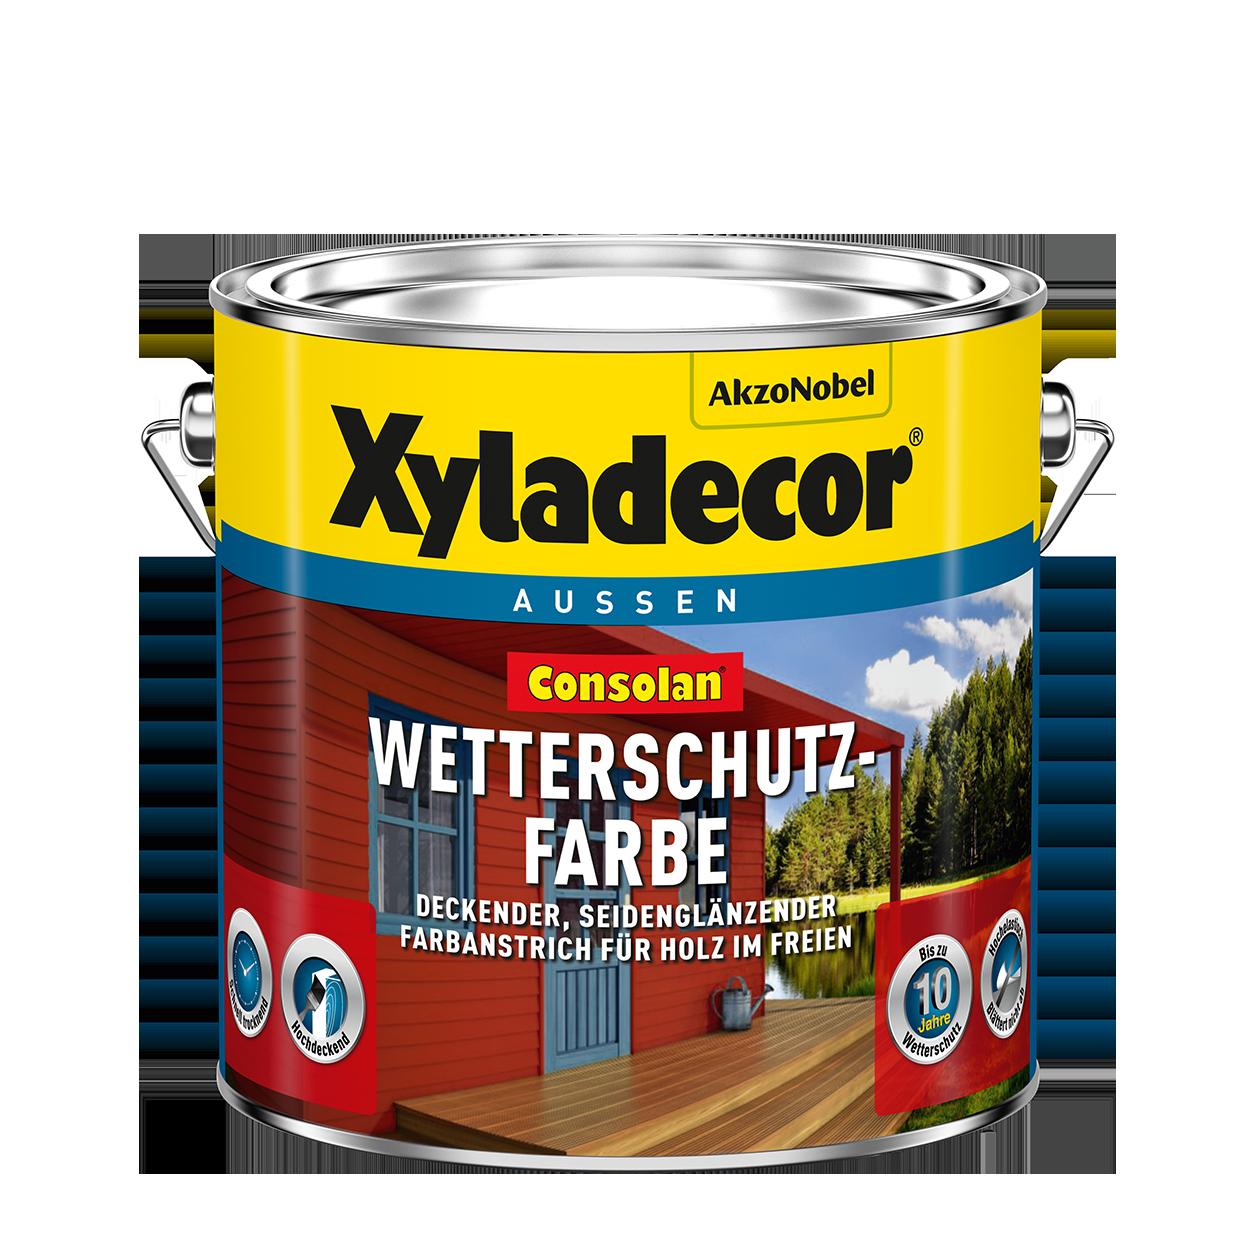 Xyladecor Consolan Wetterschutz-Farbe